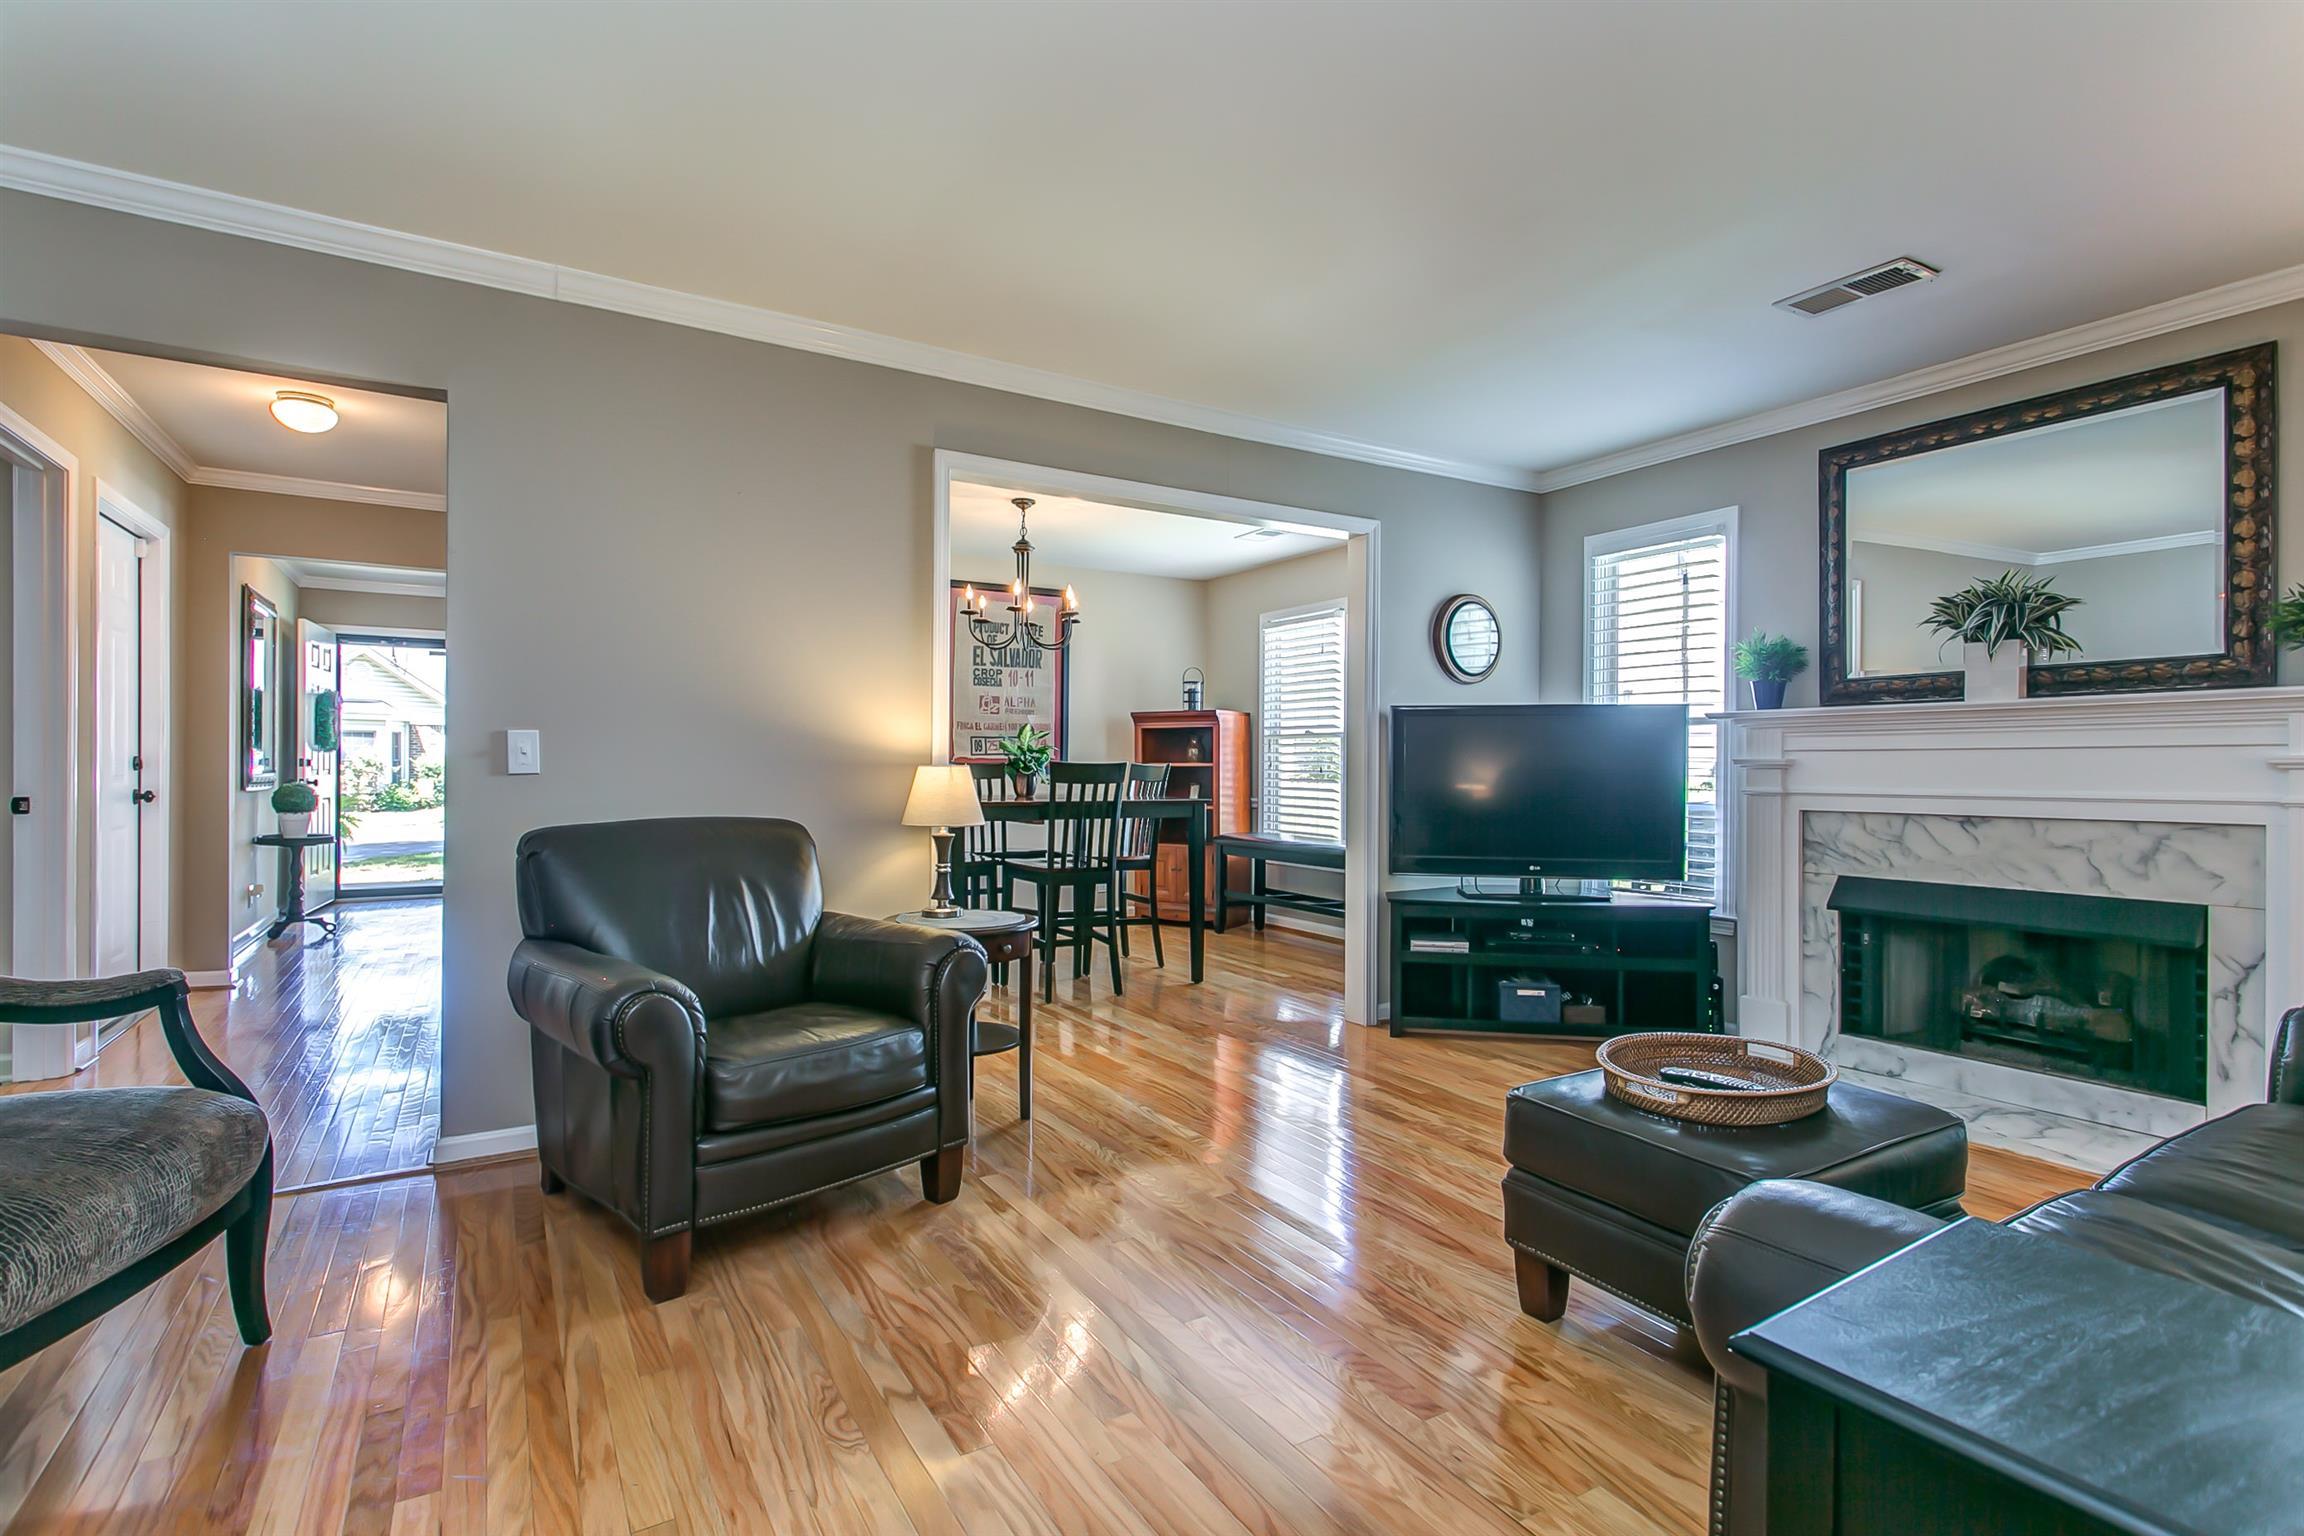 244 Myhr Green, Nashville, TN 37221 - Nashville, TN real estate listing